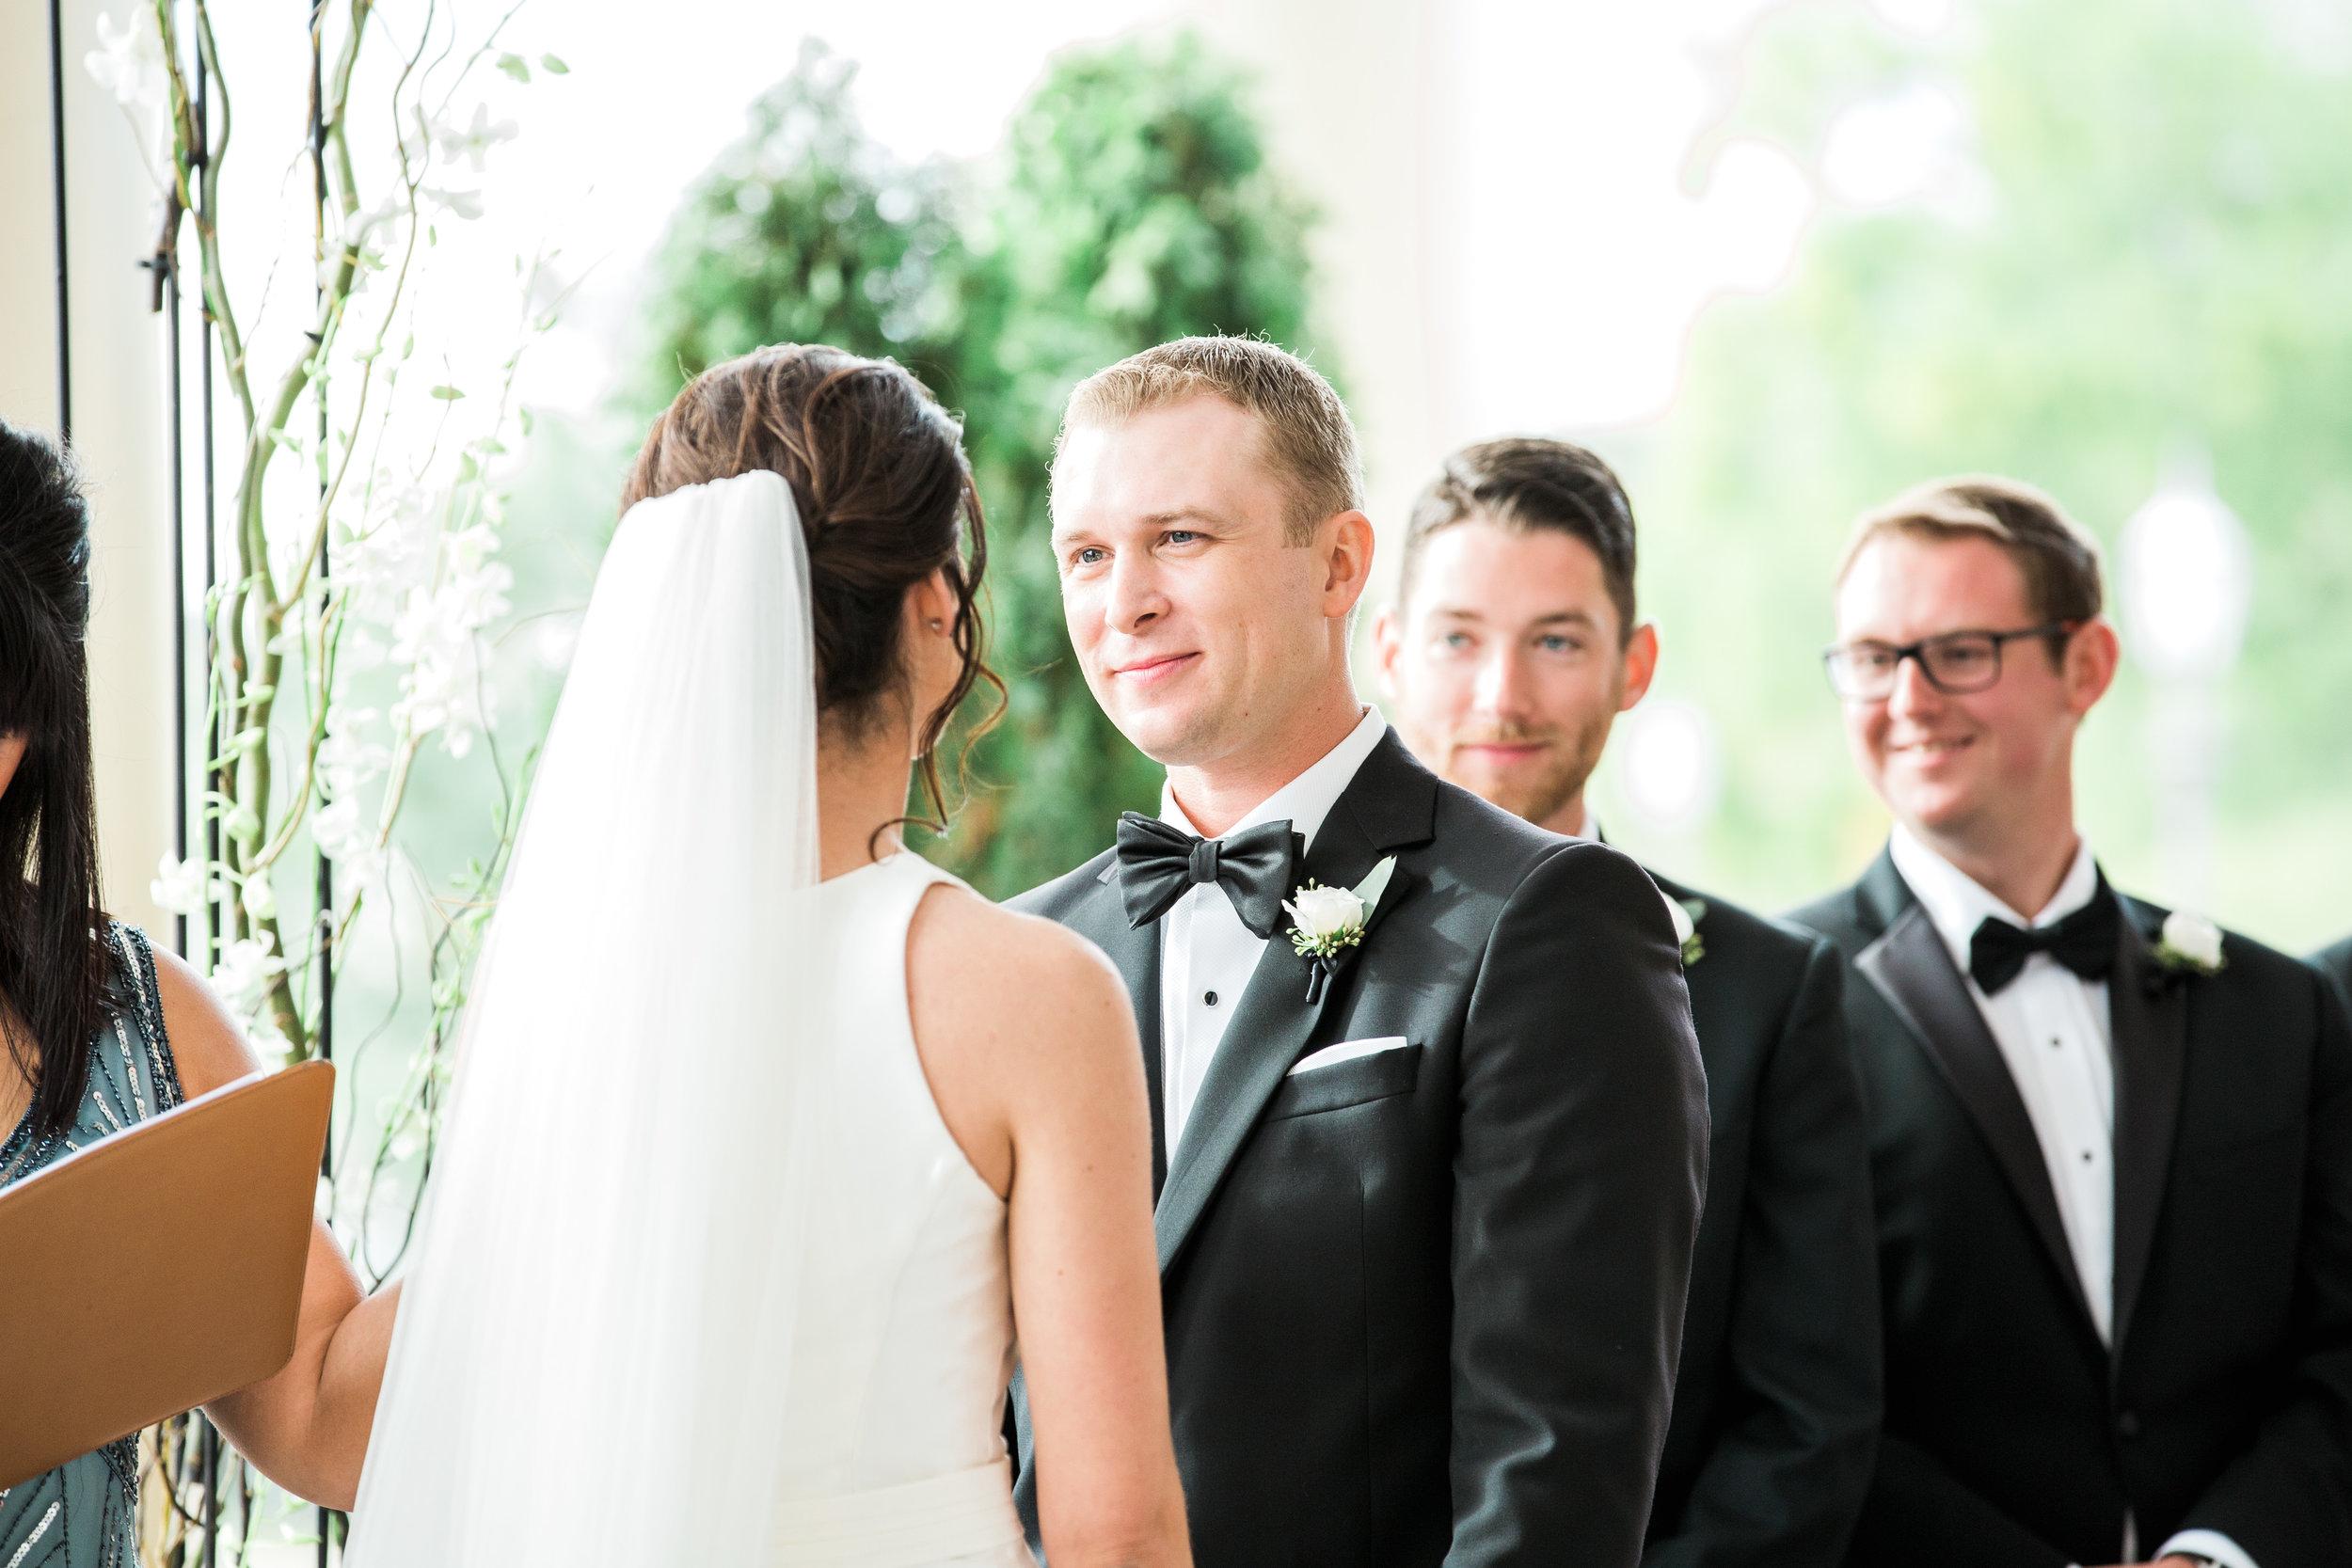 Hudson-Nichols-Black-Tie-Bride-Philadelphia-Waterworks-Wedding-Cescaphe-Ceremony18.jpg